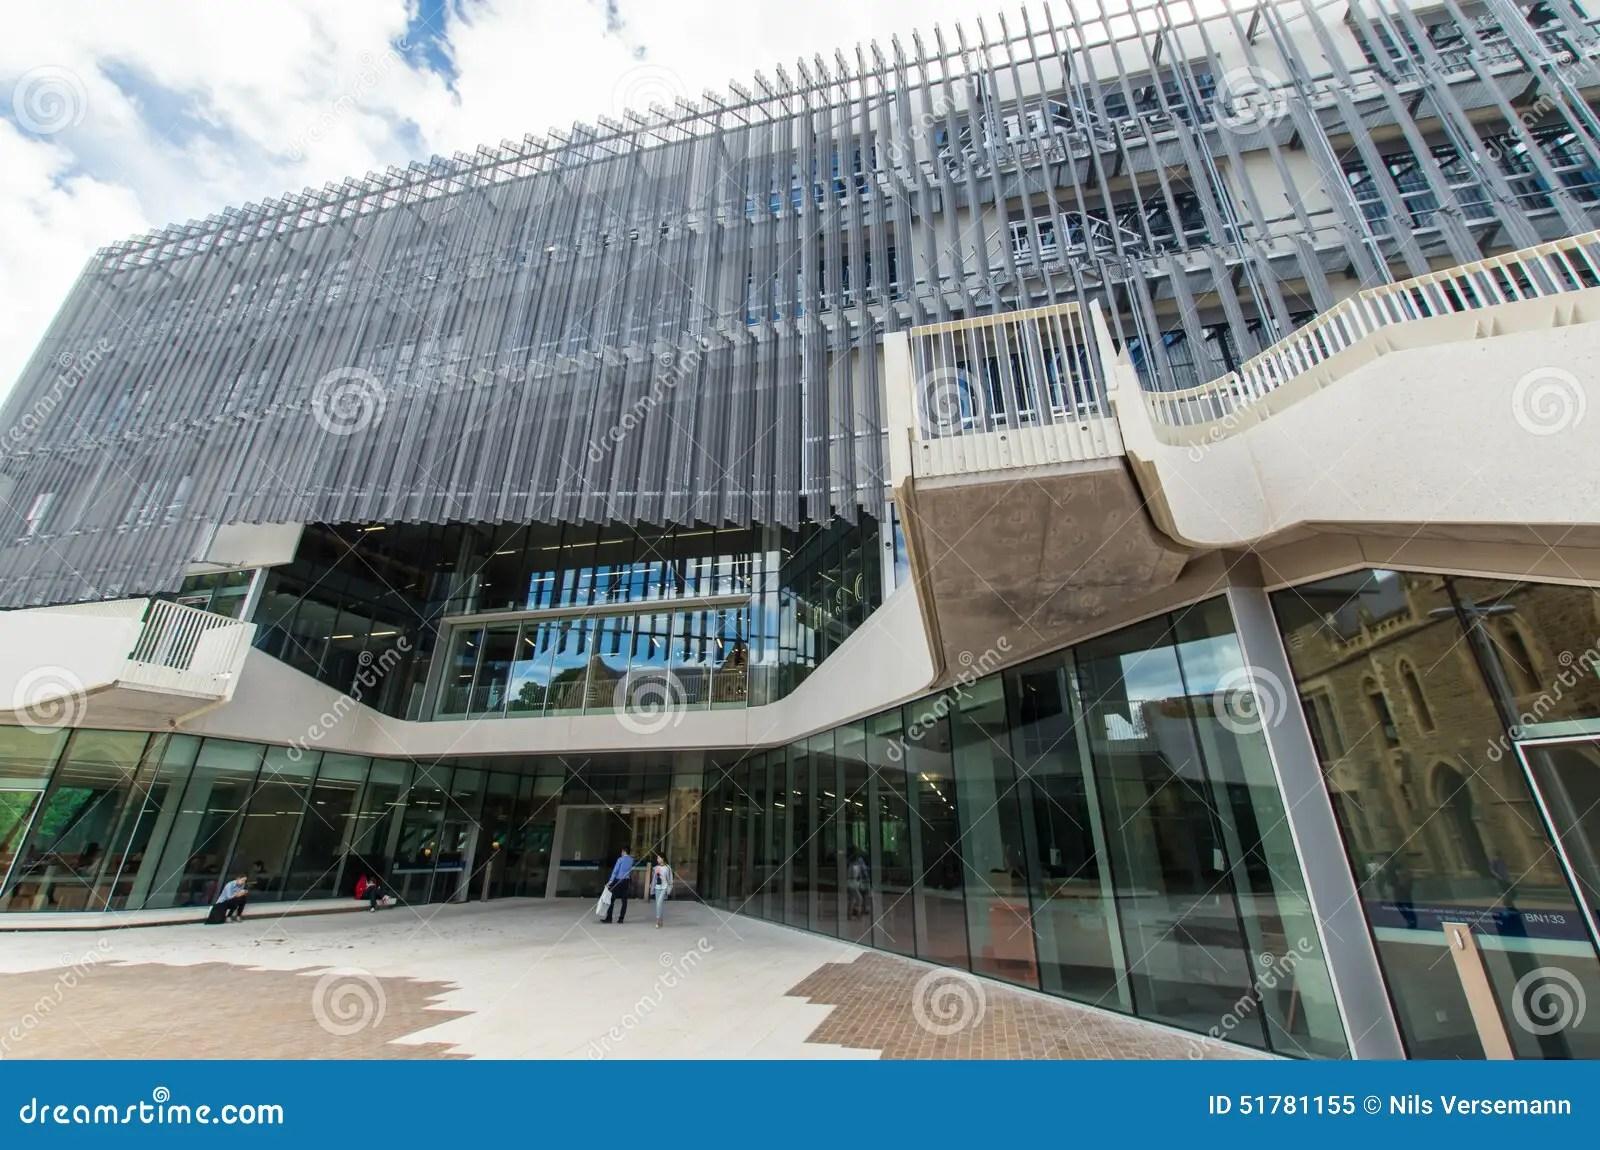 Melbourne School Of Design At The University Of Melbourne